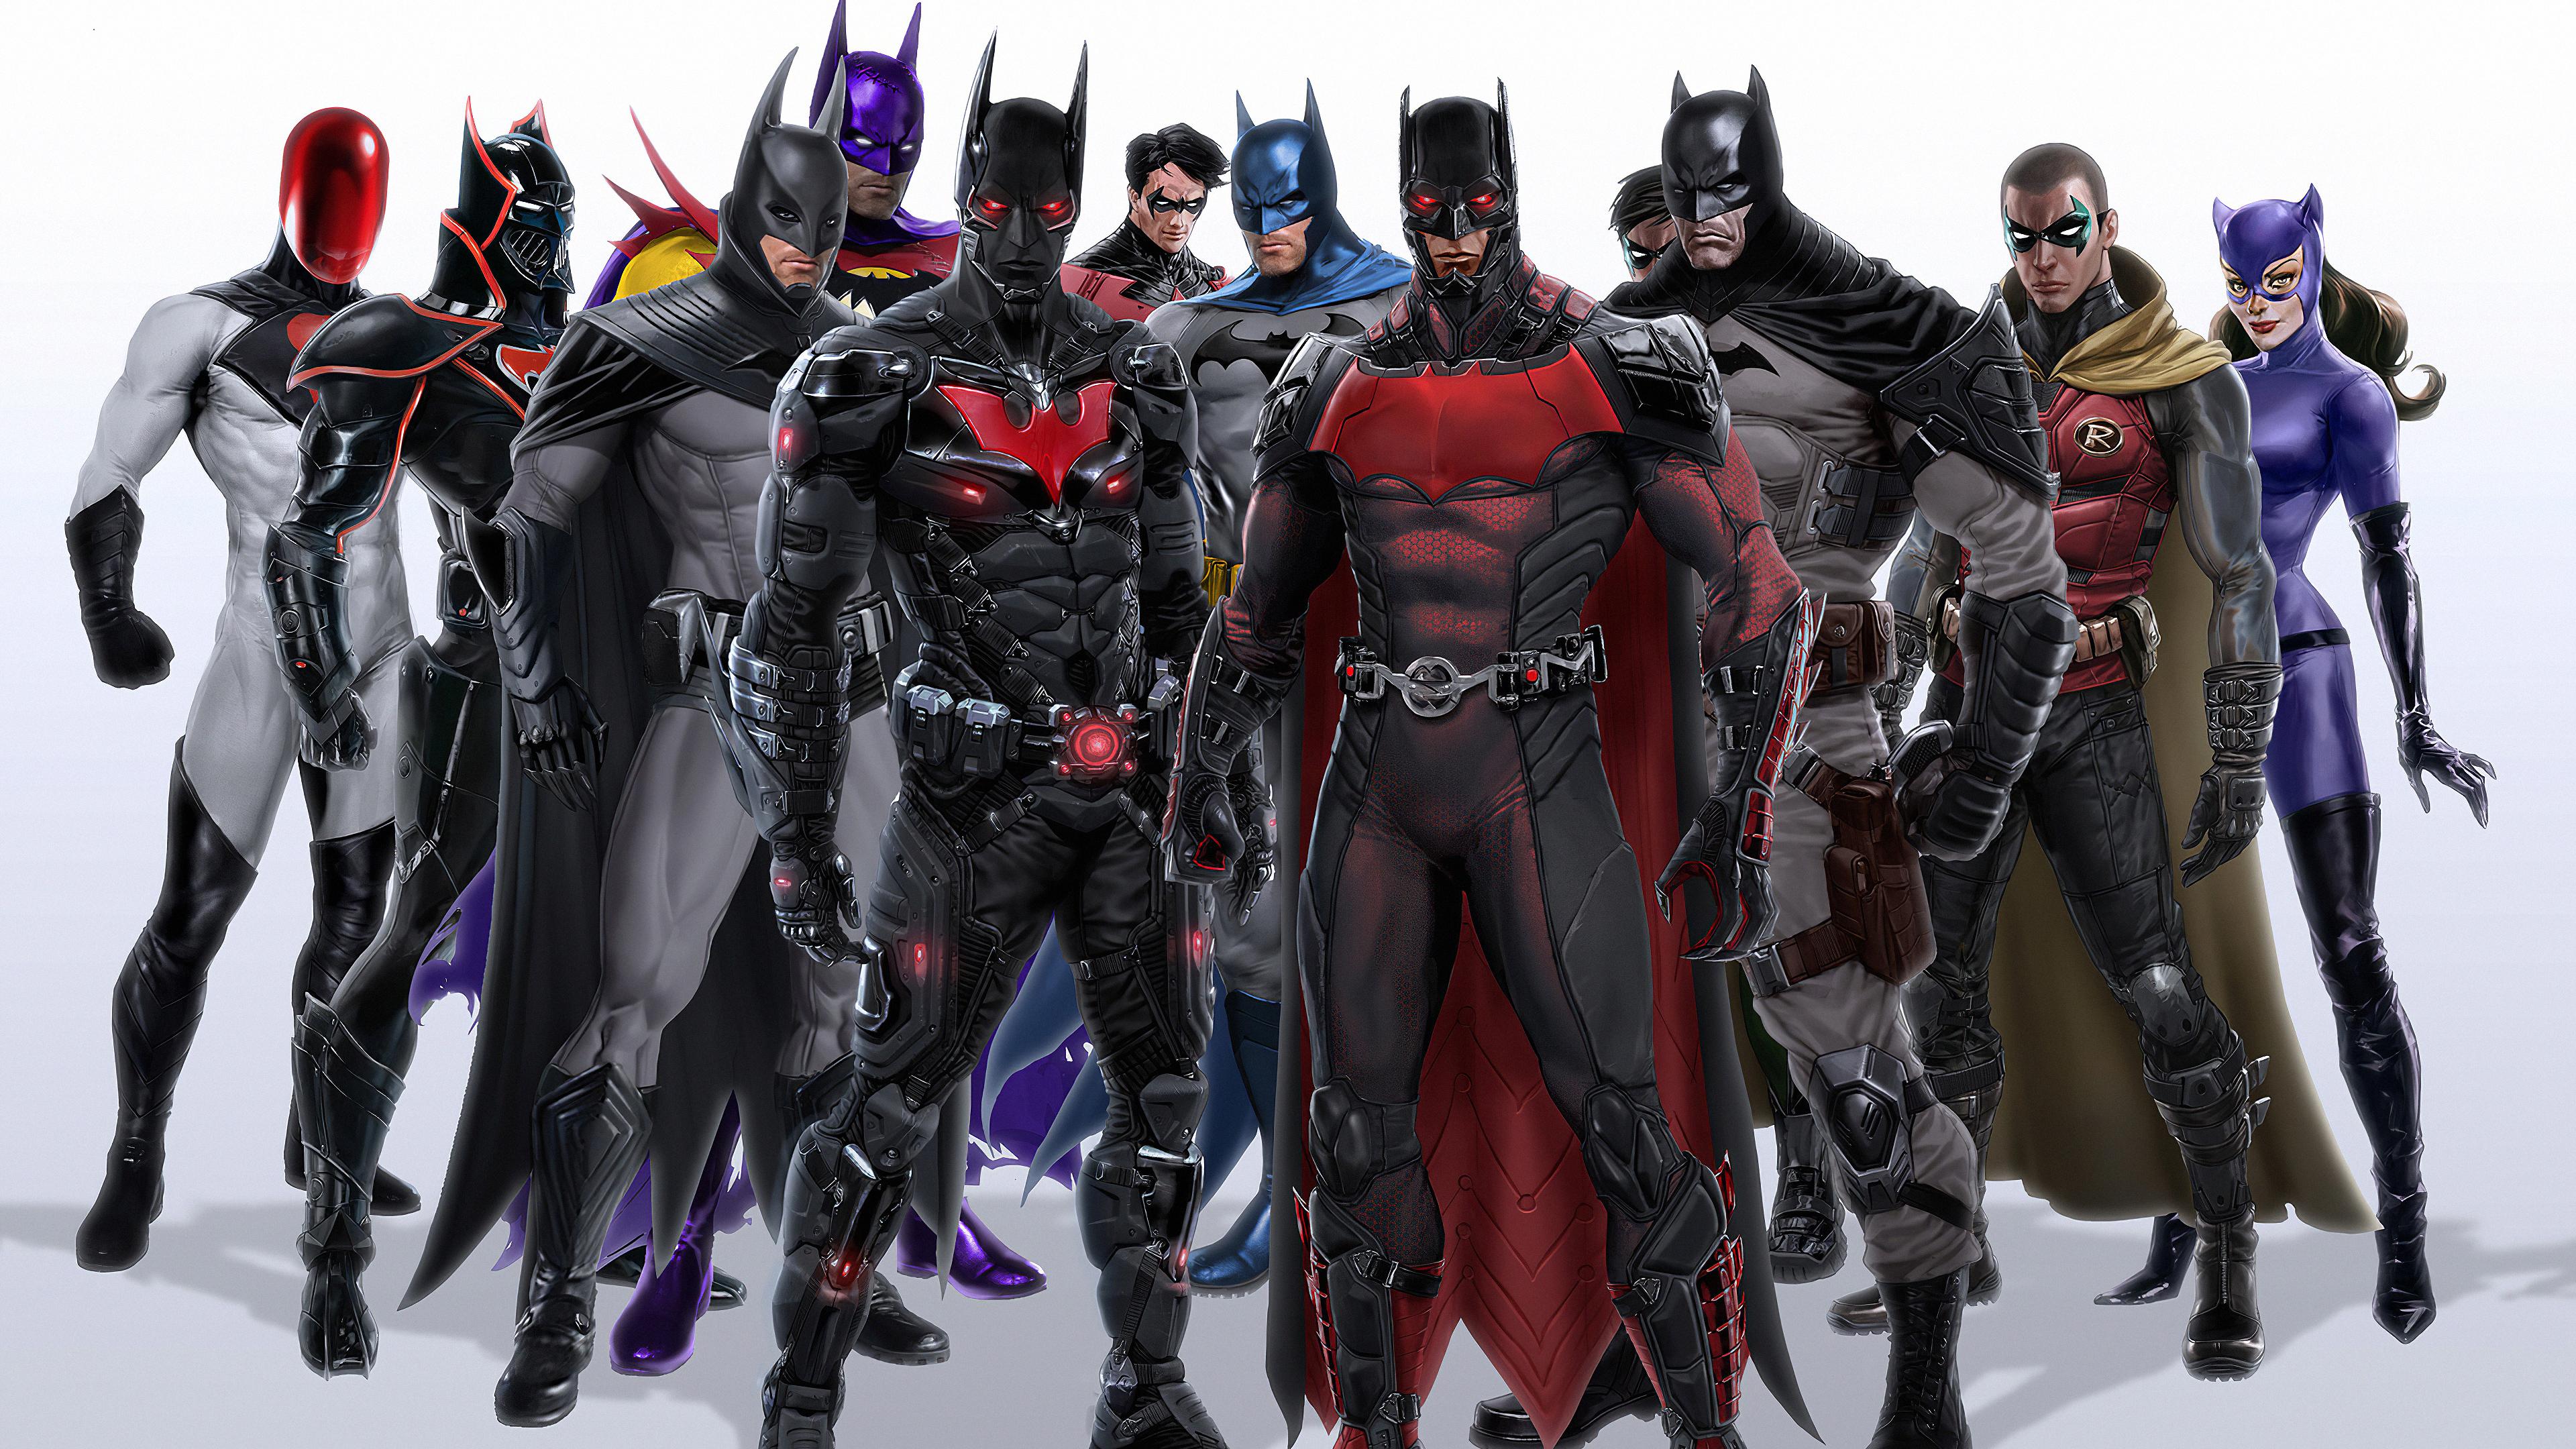 batmans artwork 1576093350 - Batmans Artwork - dark knight wallpaper 4k, batman wallpaper phone hd 4k, batman wallpaper 4k, batman art wallpaper 4k, Batman 4k hd wallpaper